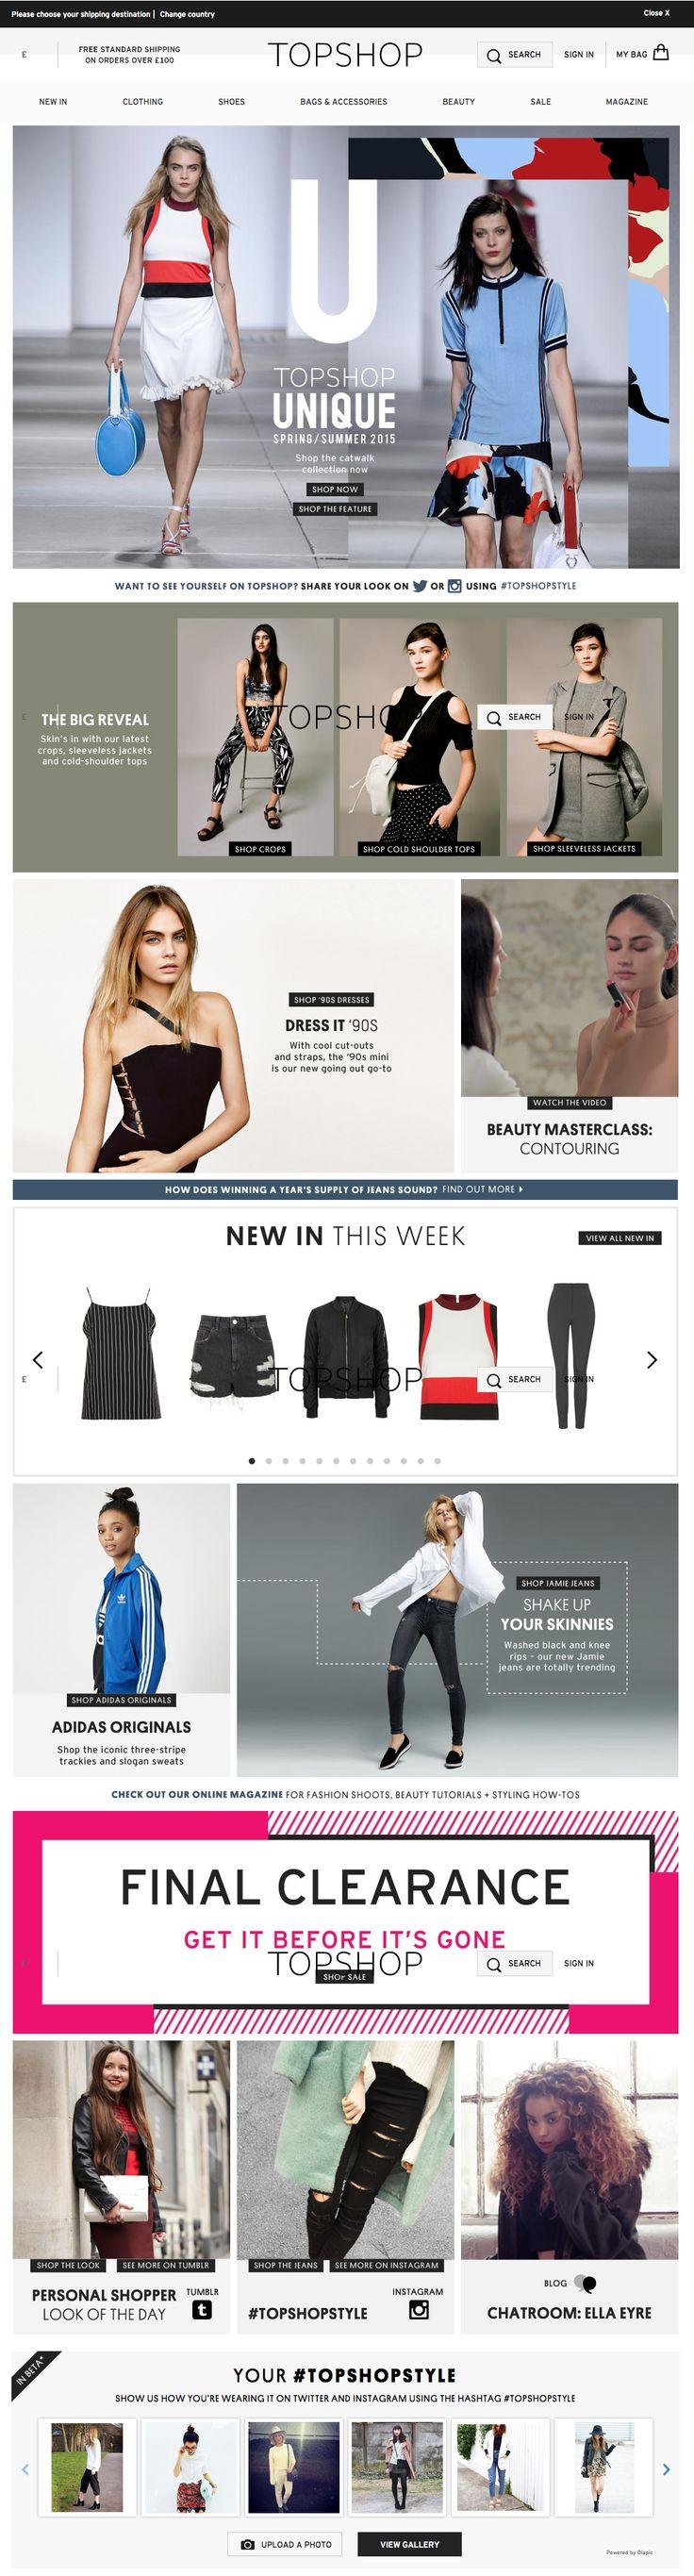 7fbe9b1133202888b7c760486e6fe8fd webdesign inspiration topshop 60 best fashion e commerce design images on pinterest,E Commerce Womens Clothing